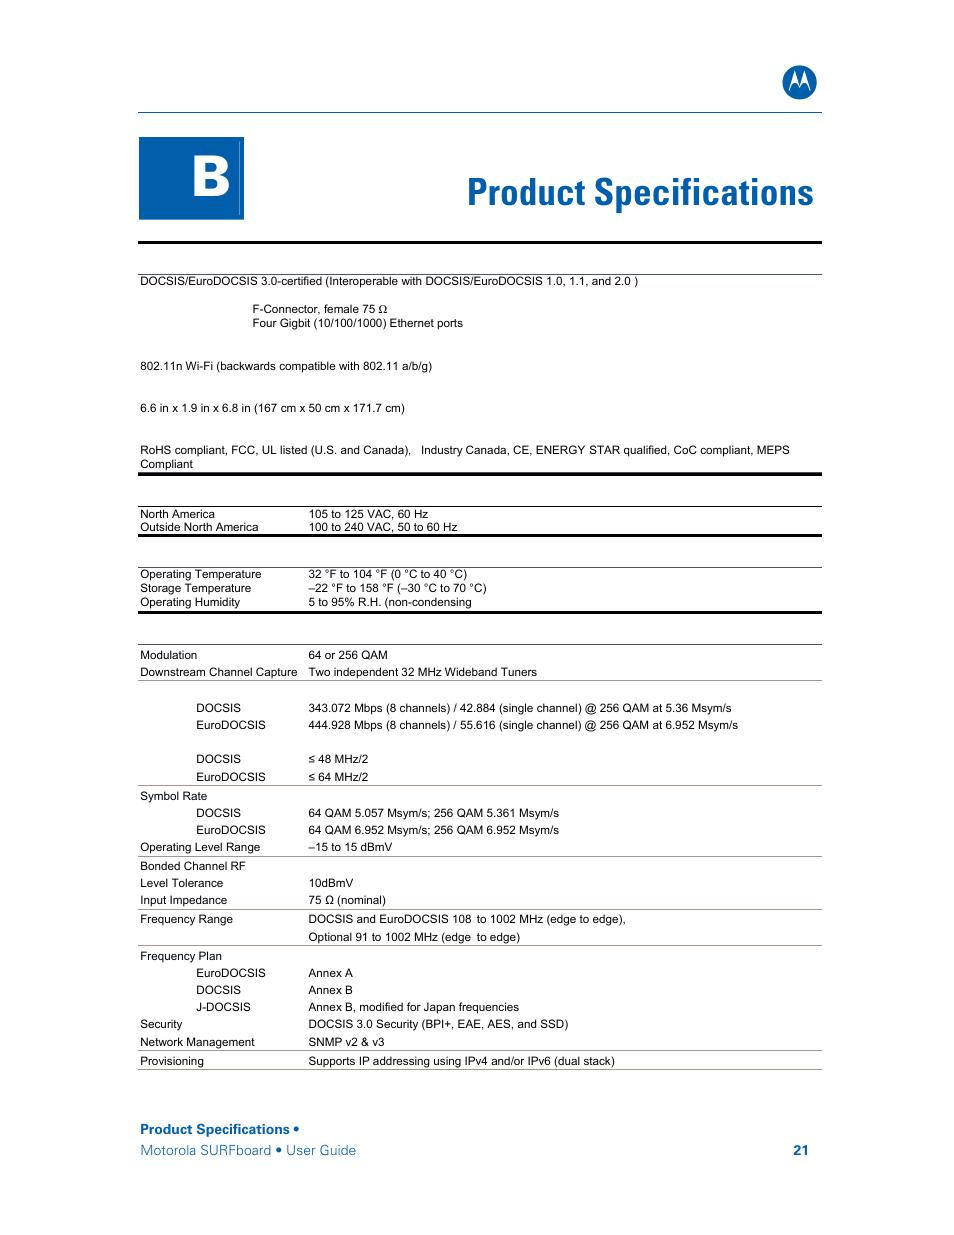 Product Specifications Motorola Surfboard Sbg6580 Series User